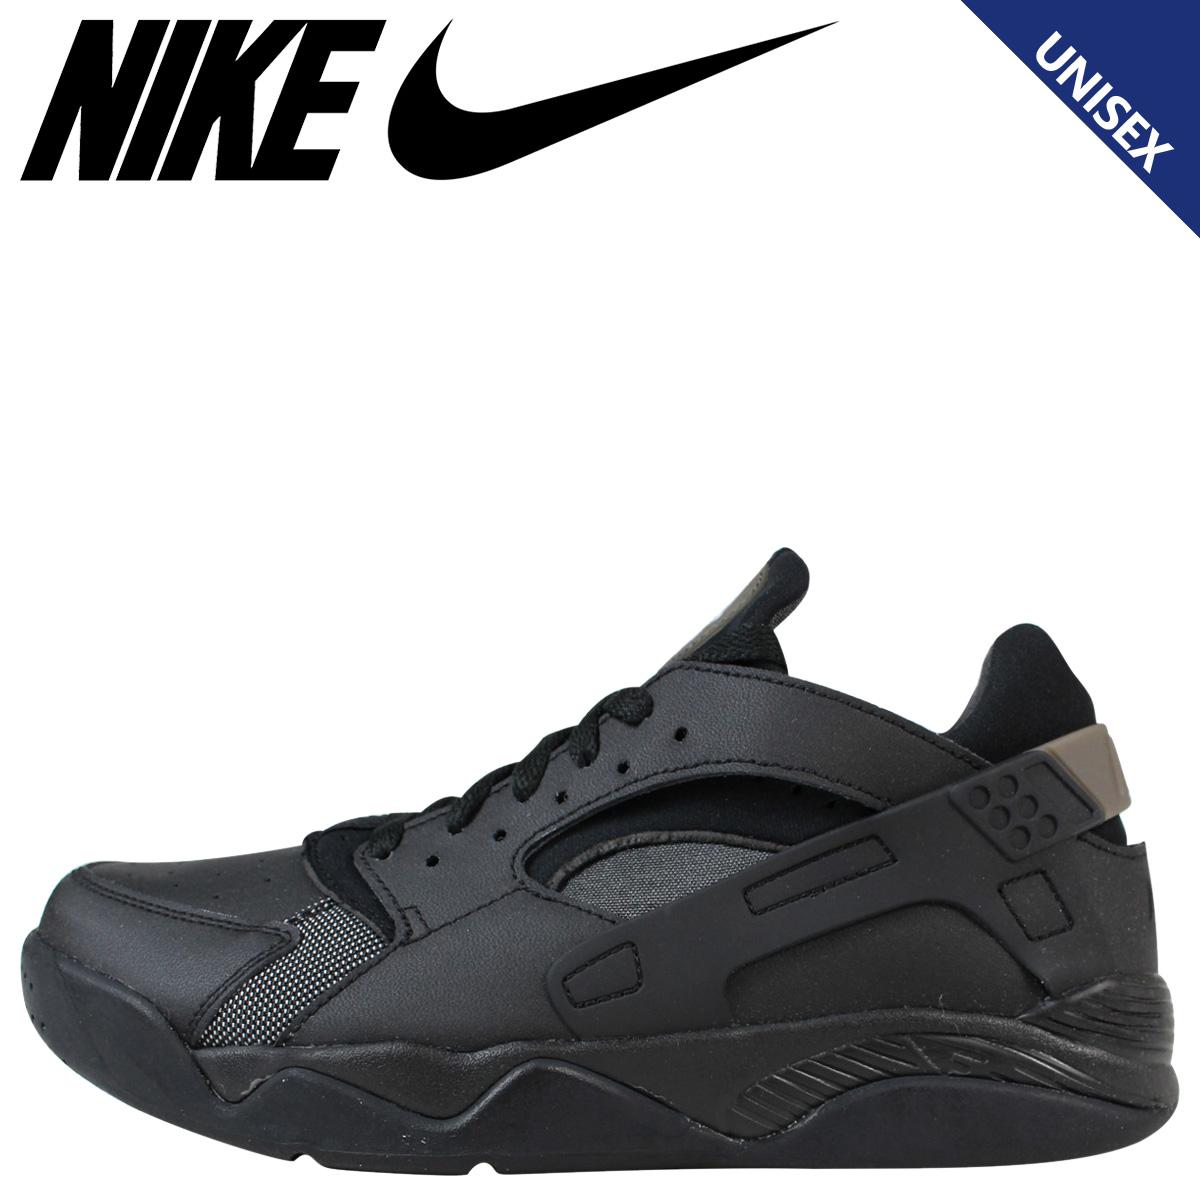 Sugar Online Shop  NIKE Nike airflight sneakers AIR FLIGHT HUARACHE air  flight halti 819847-002 men s women s shoes black  fa82db0e33